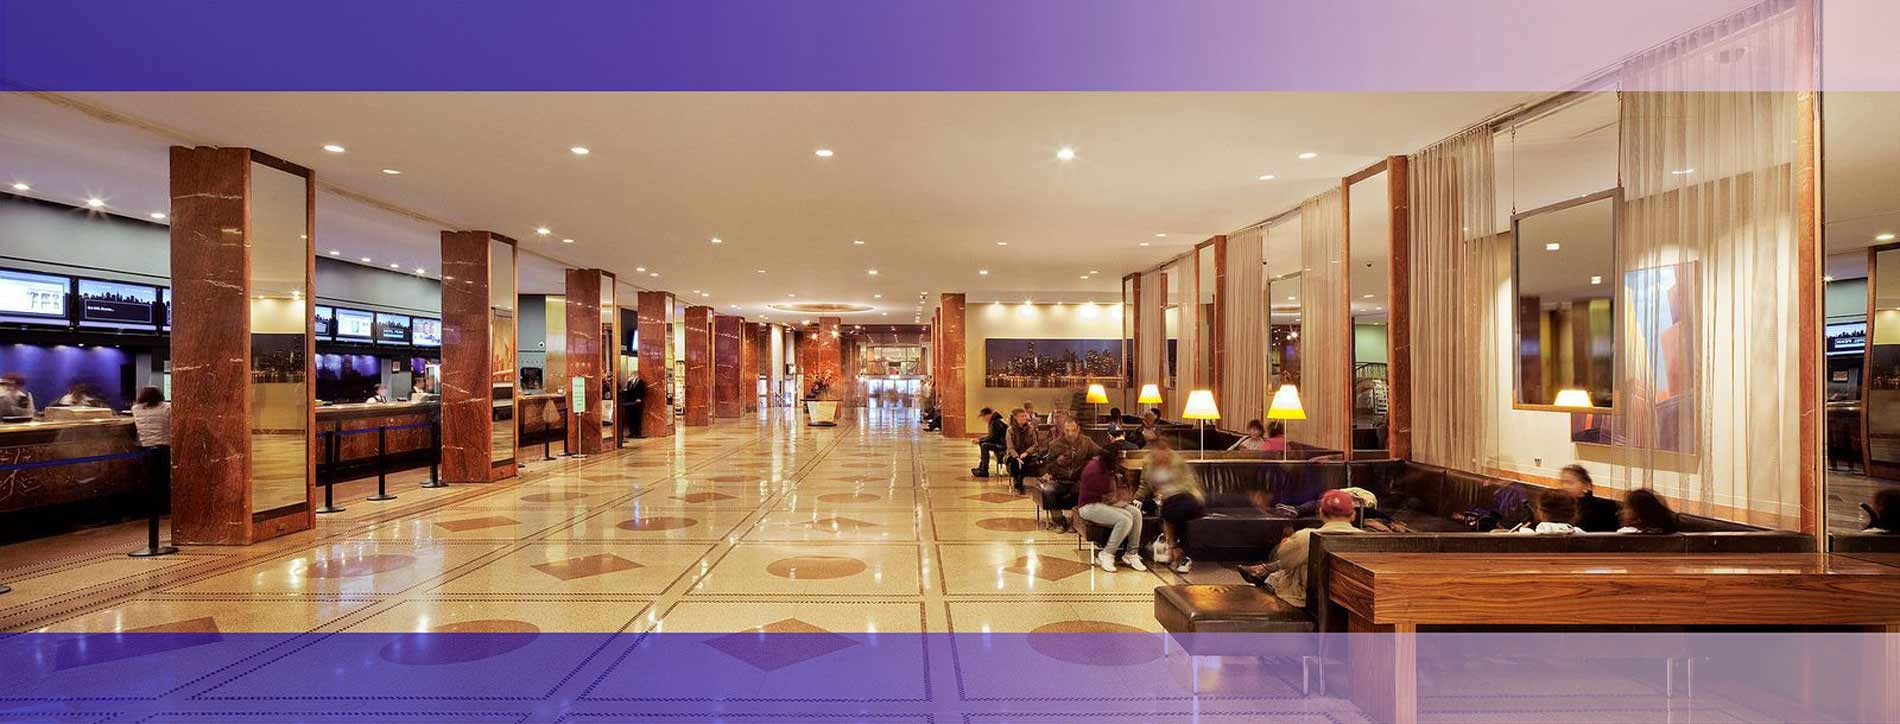 tarahi dakheli hotel 9jp - طراحی داخلی هتل